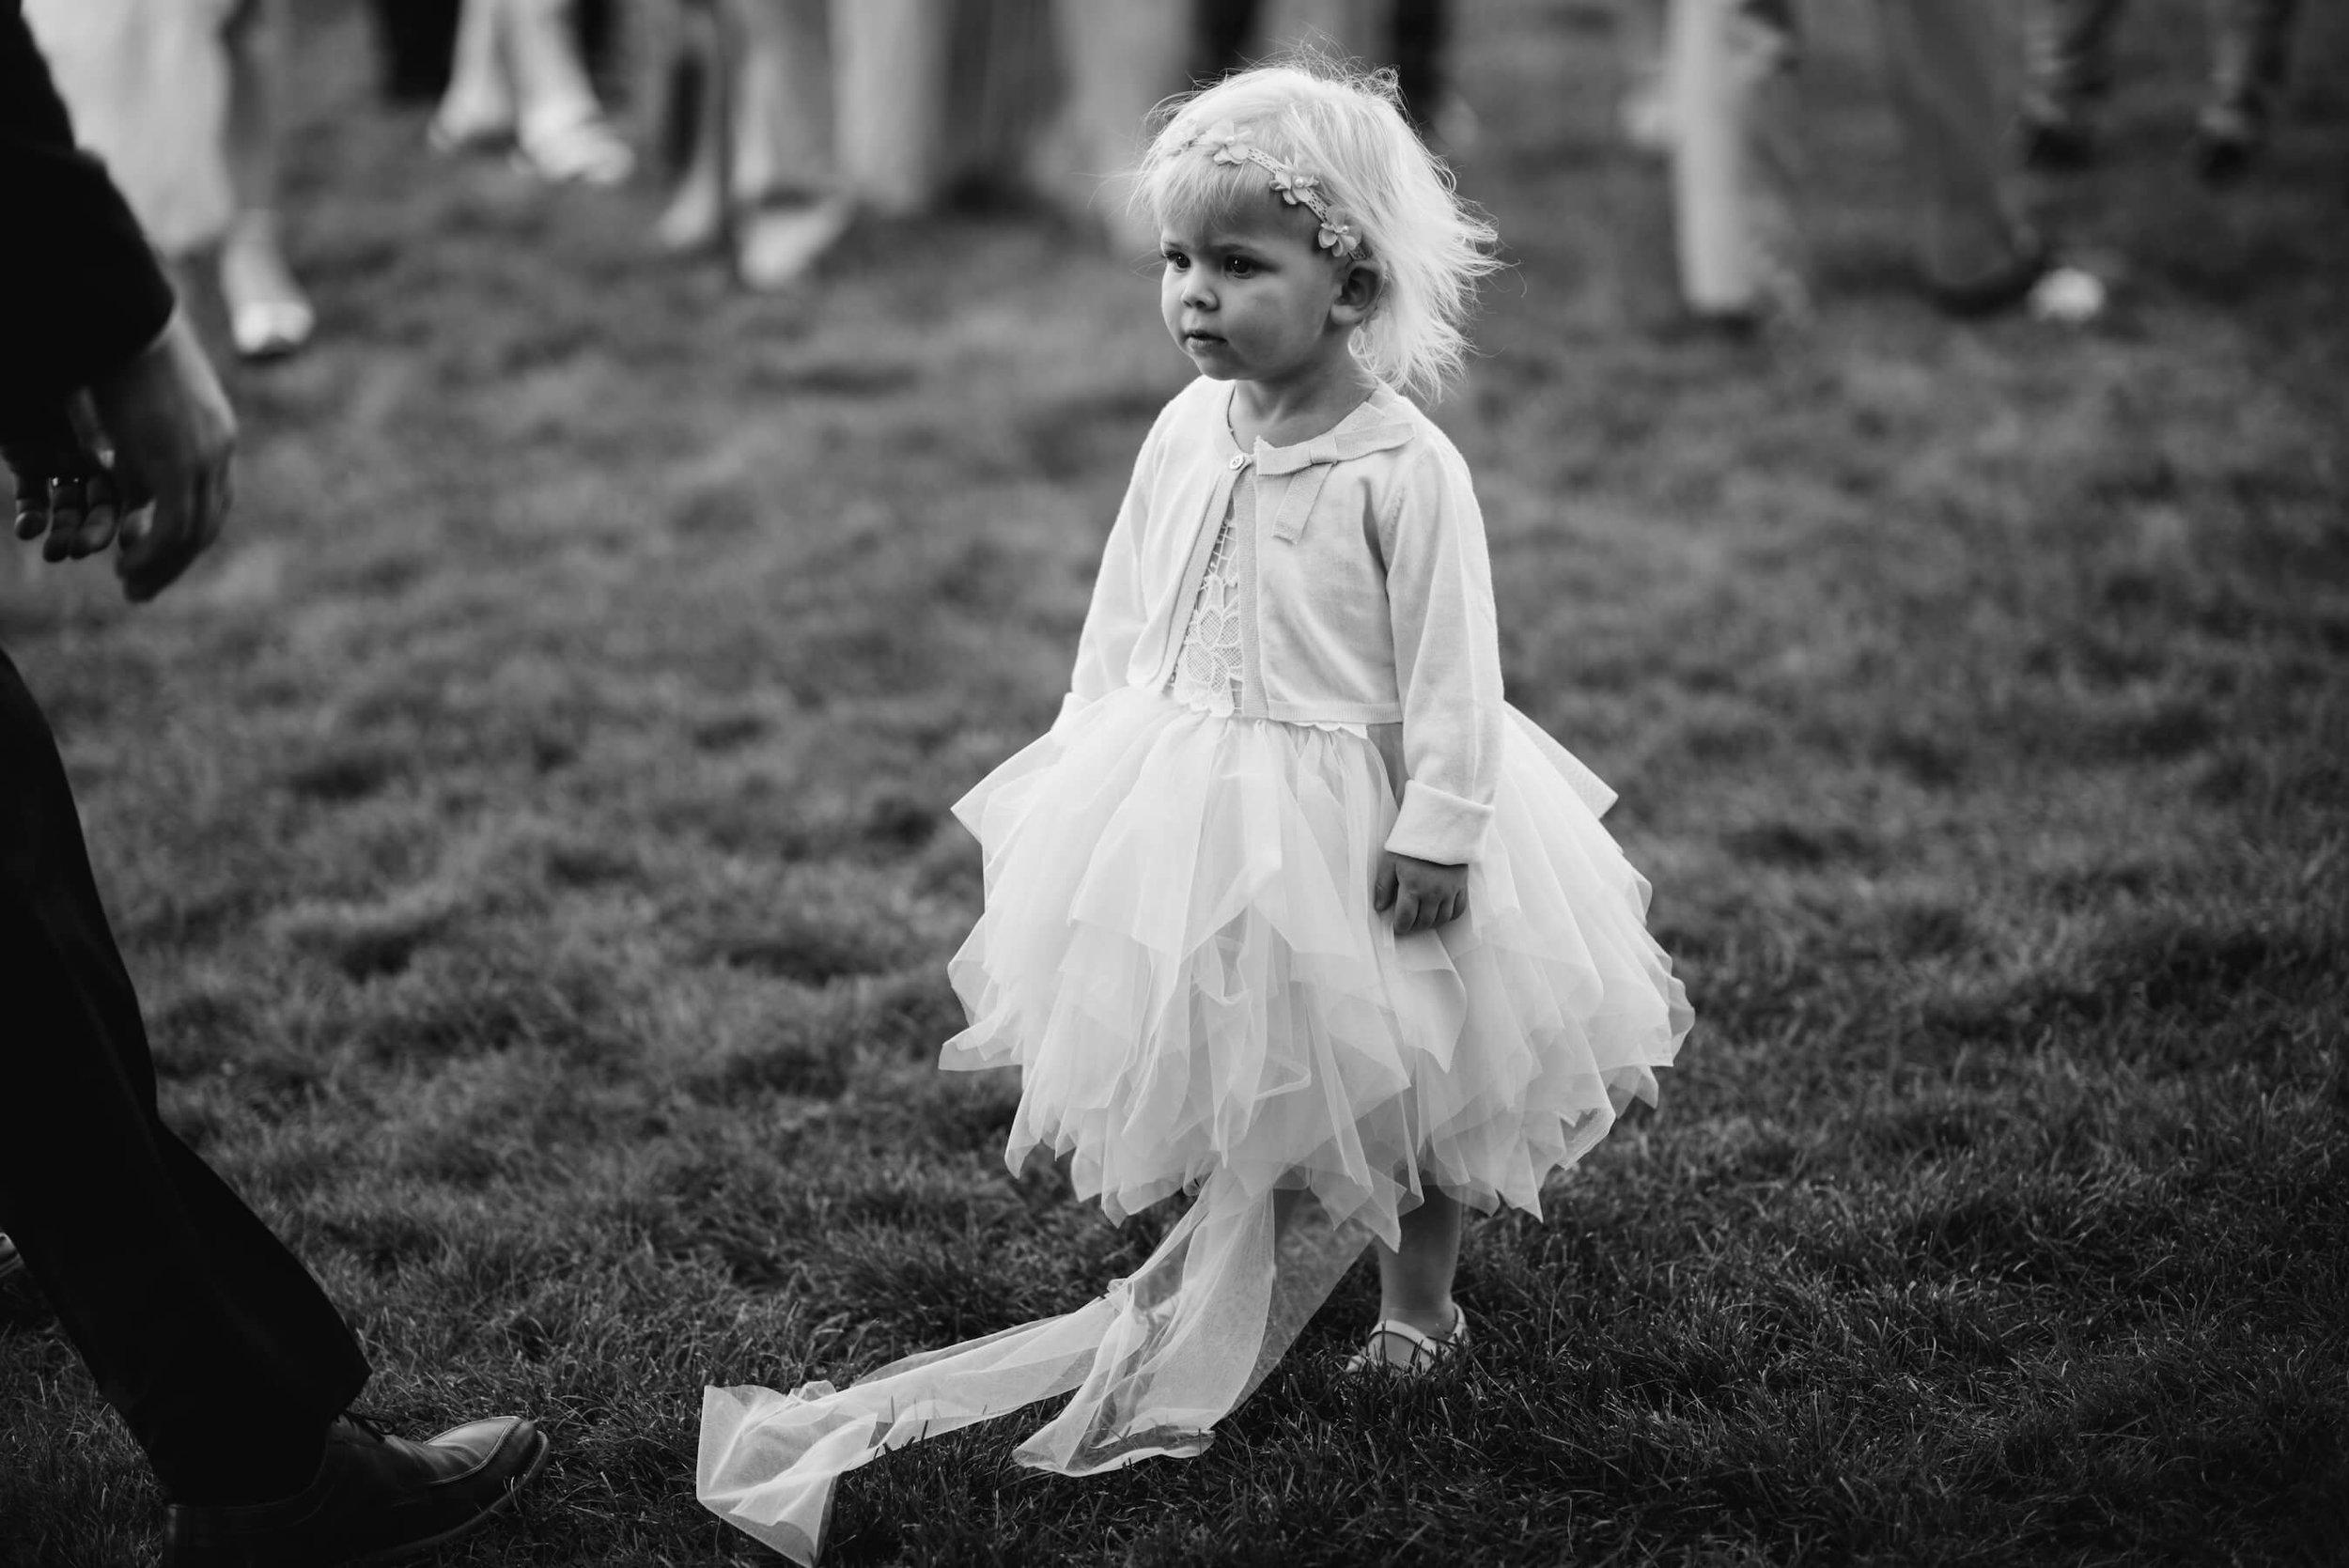 engle-olson-wedding-blair-taylor-30.jpg